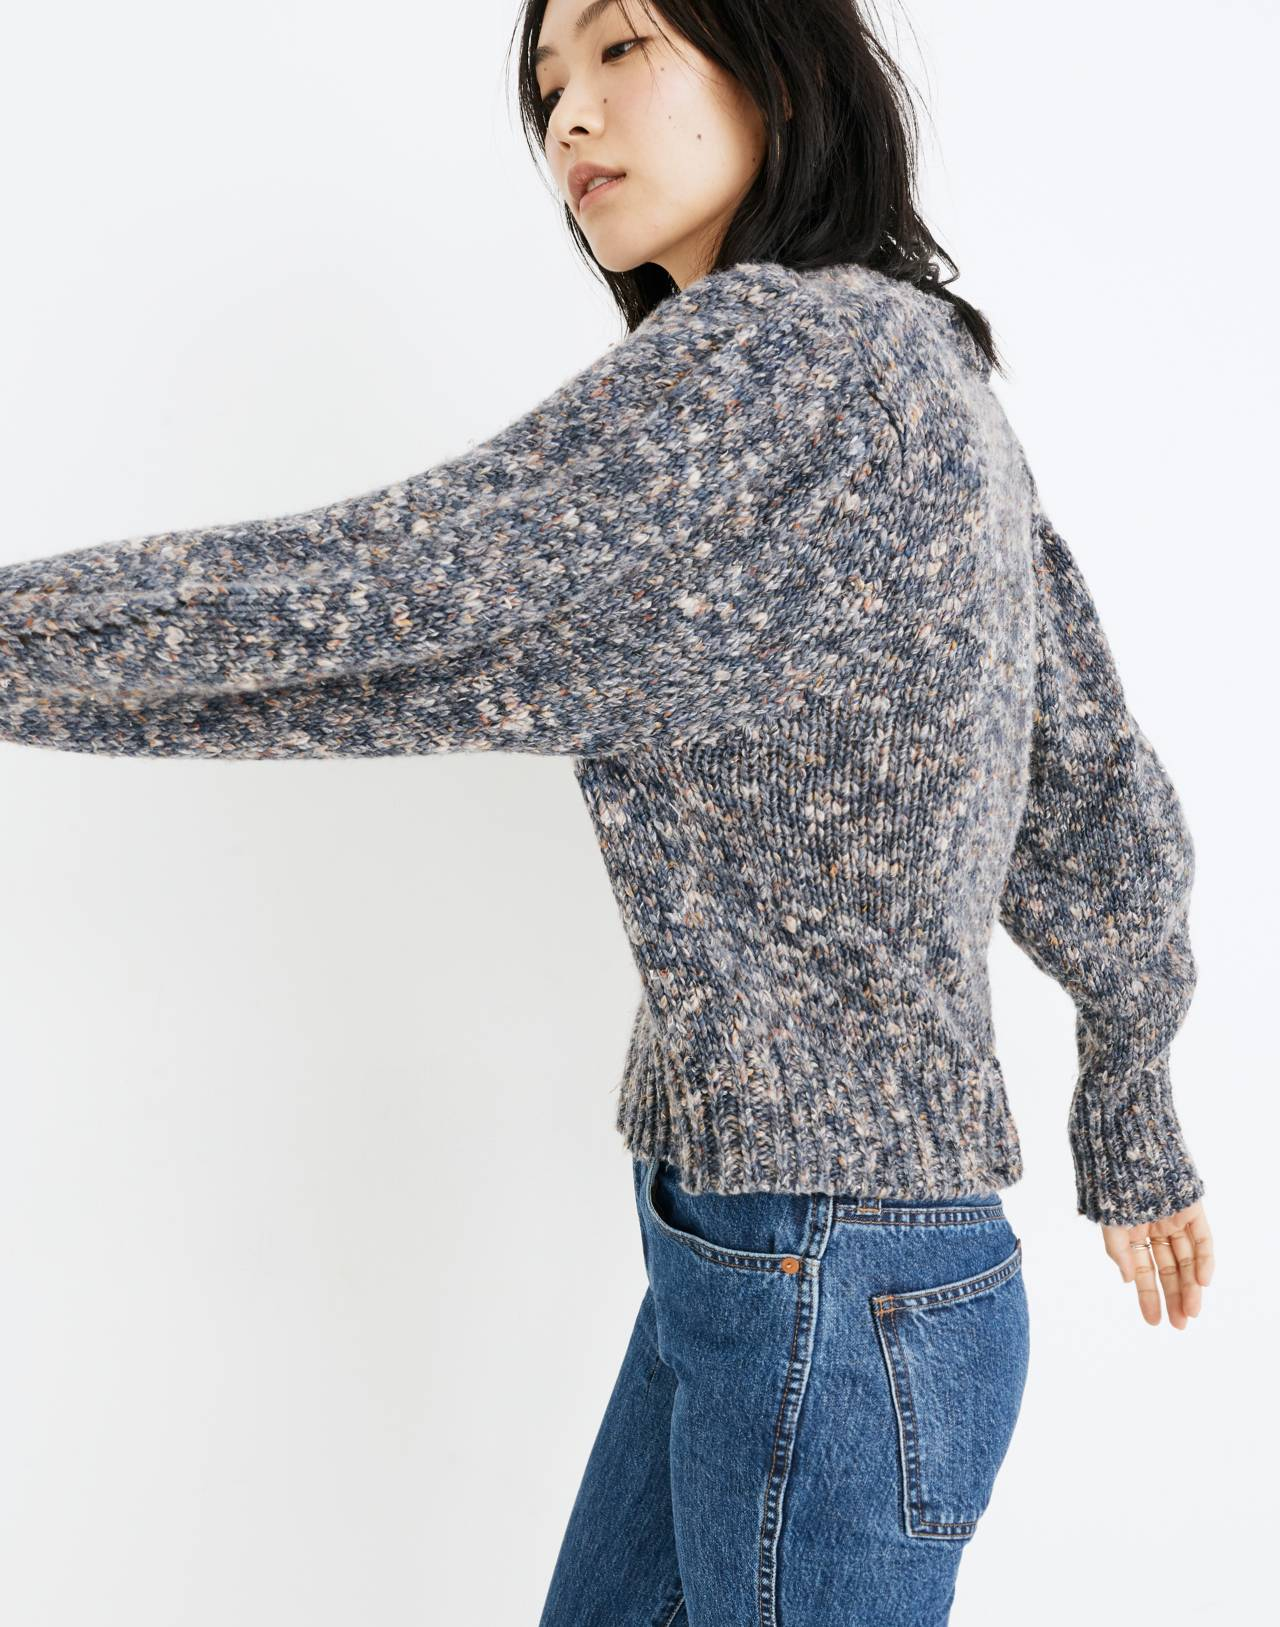 Pleat-Shoulder Pullover Sweater in marled indigo image 2